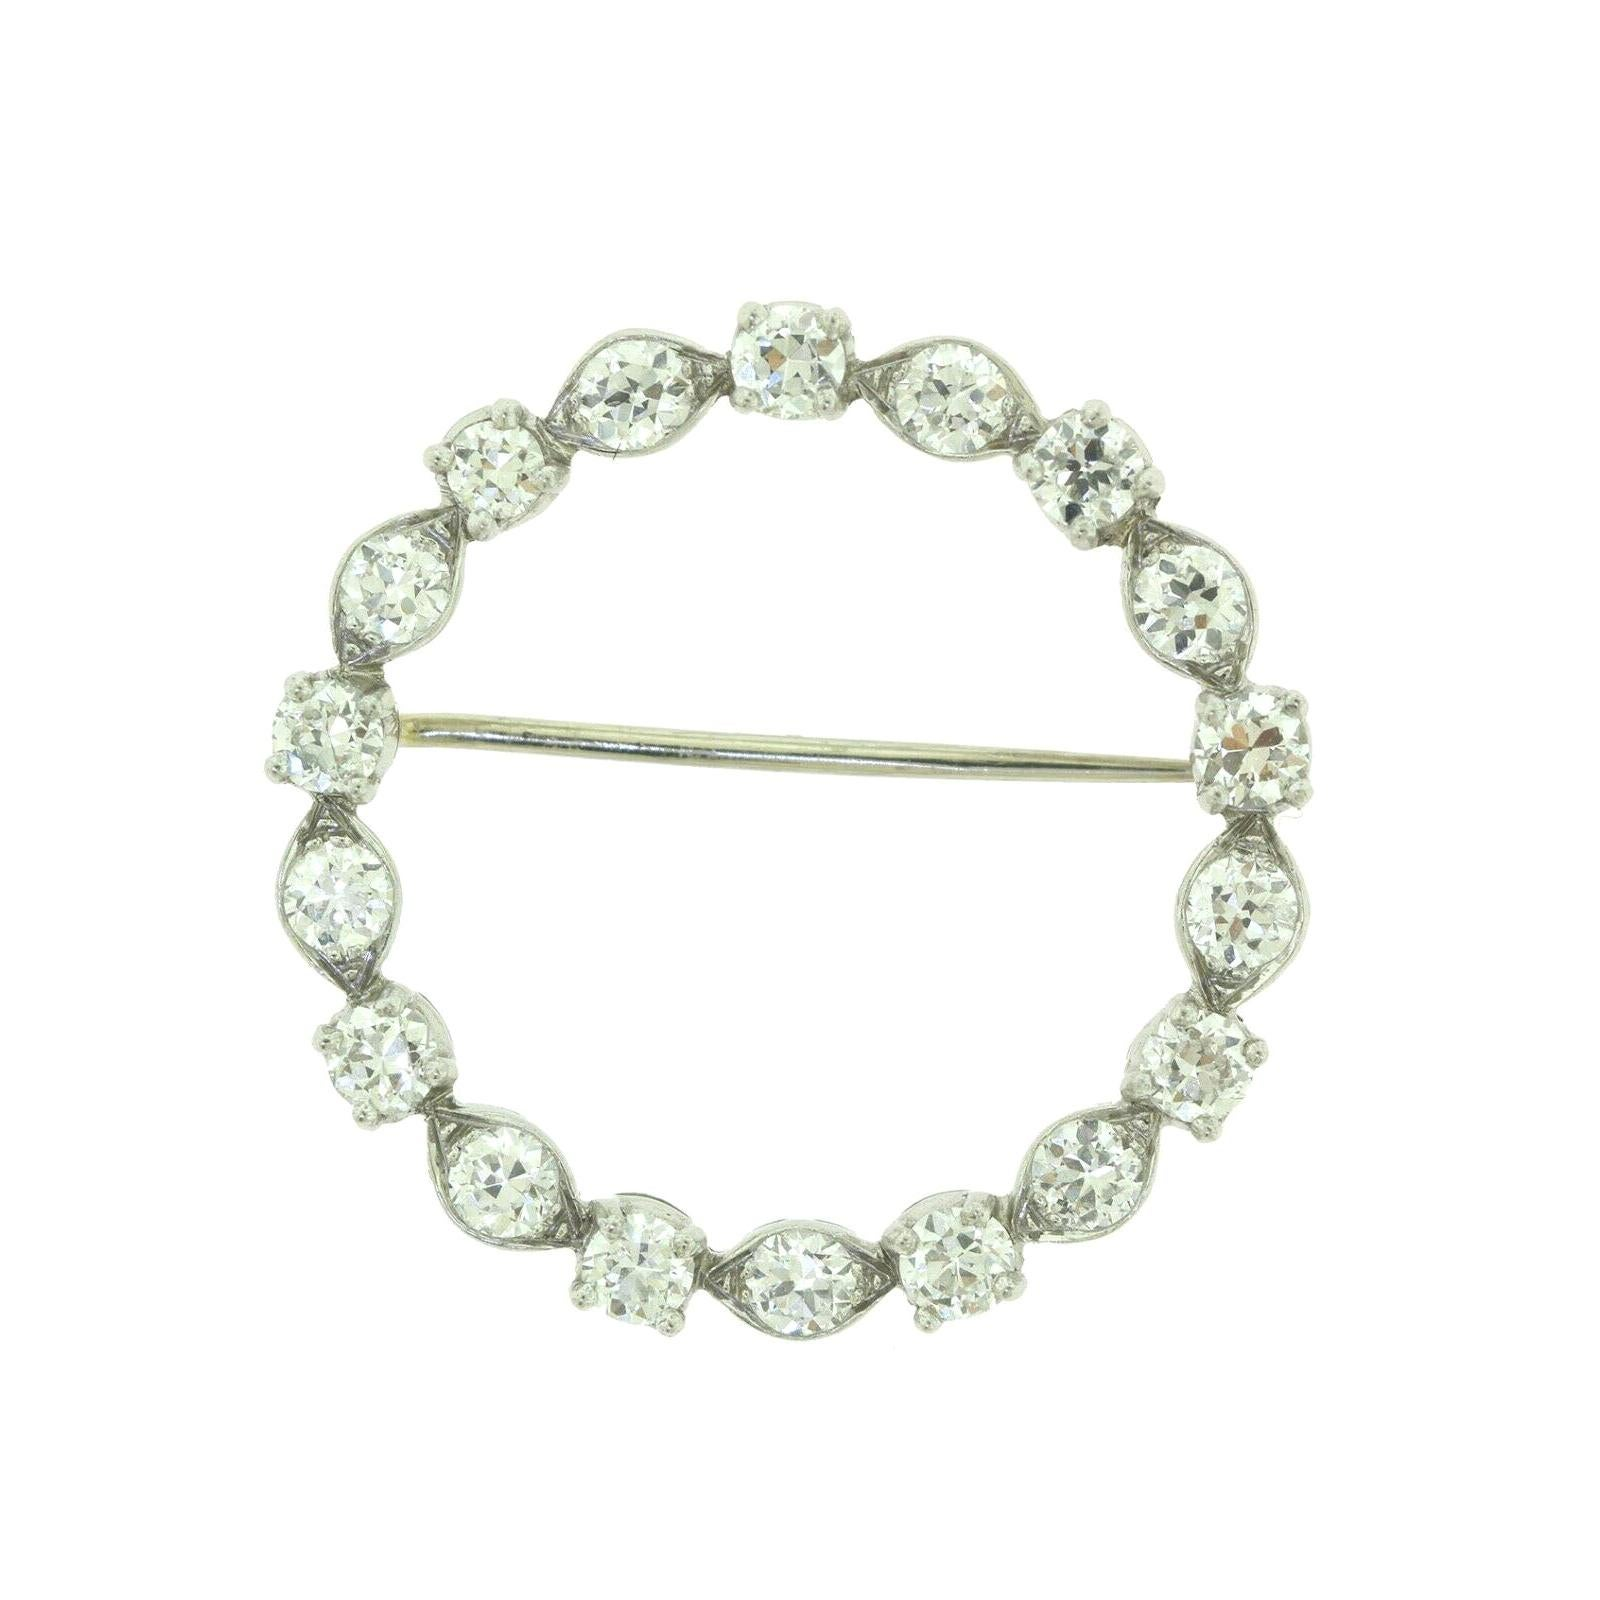 Tiffany & Co. 1920 Art Deco Platinum Round Diamond Brooch Pin